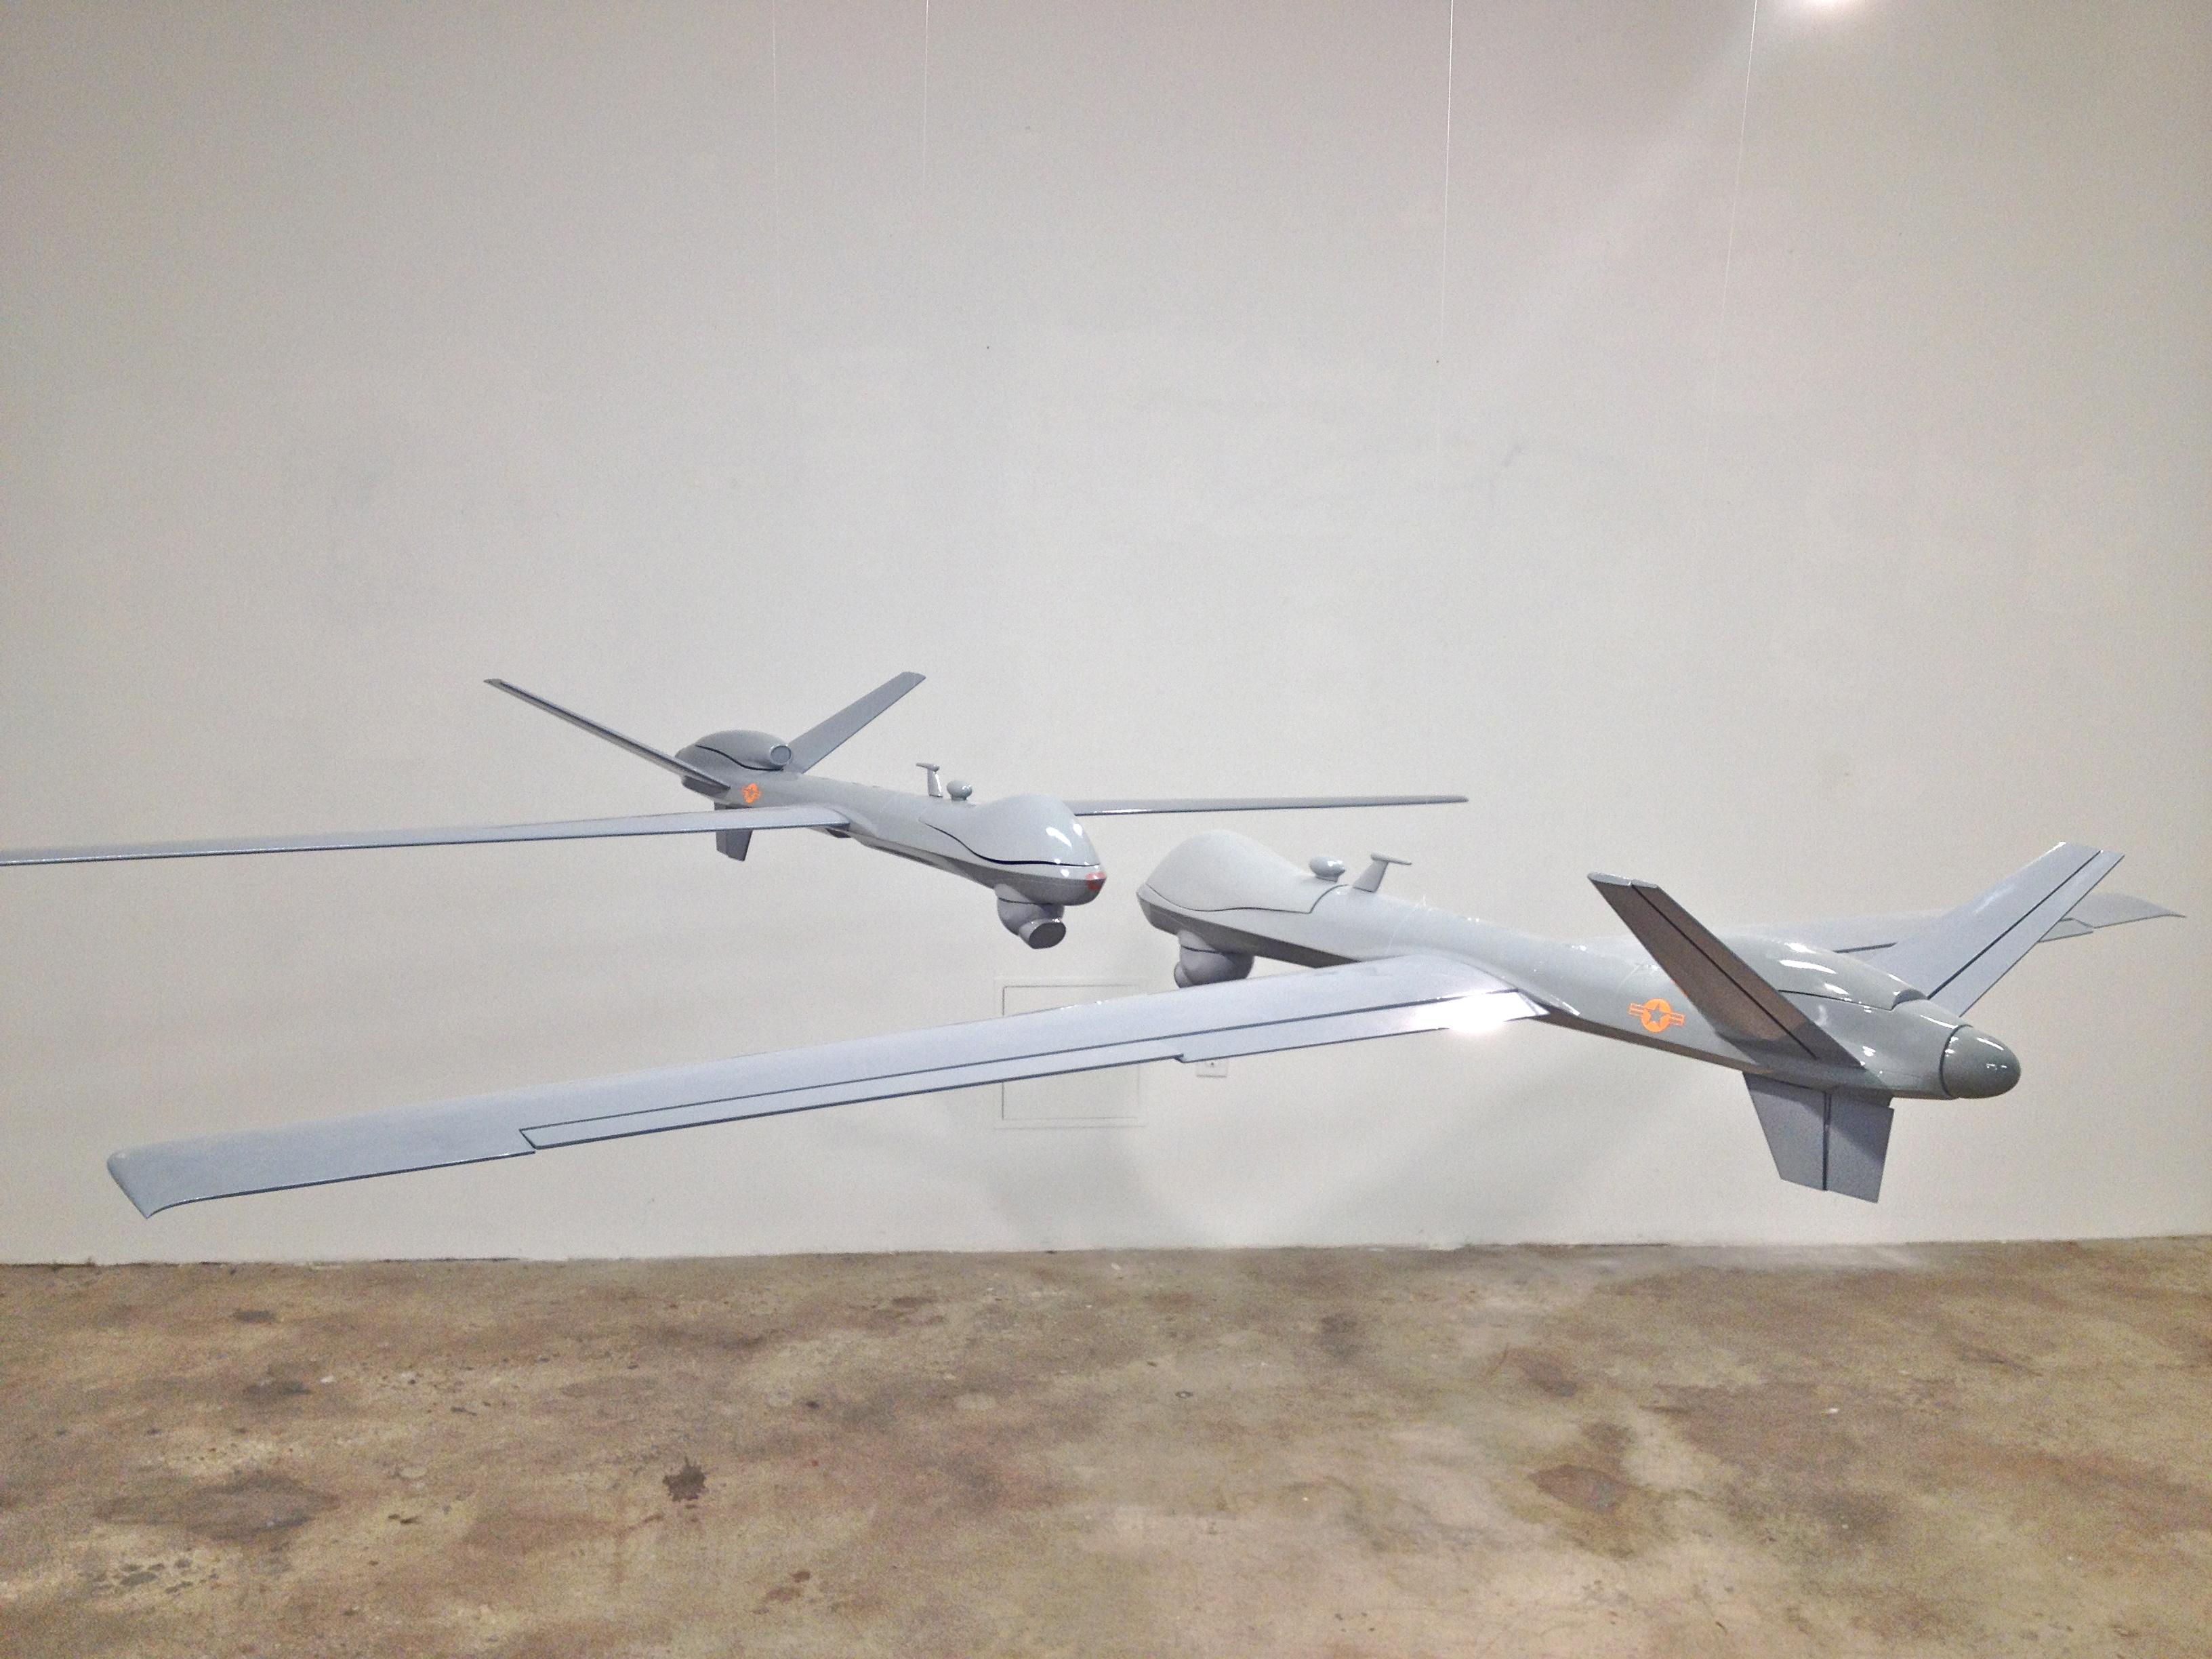 Drones Kissing